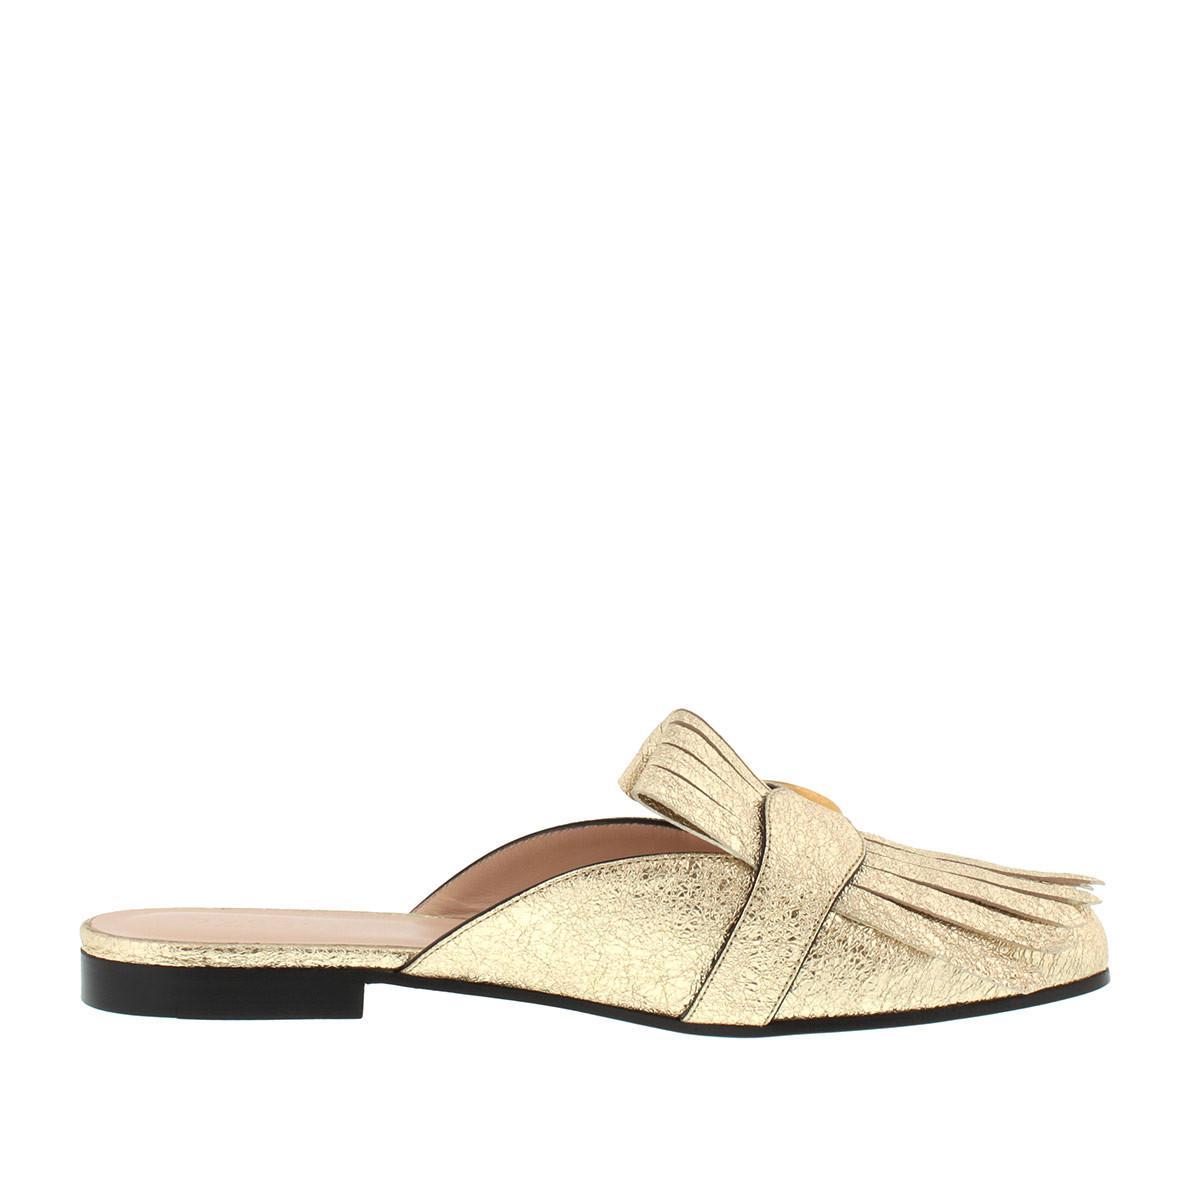 77d1e1cc7 Gucci - Marmont Metallic Laminate Leather Slipper Gold - Lyst. View  fullscreen